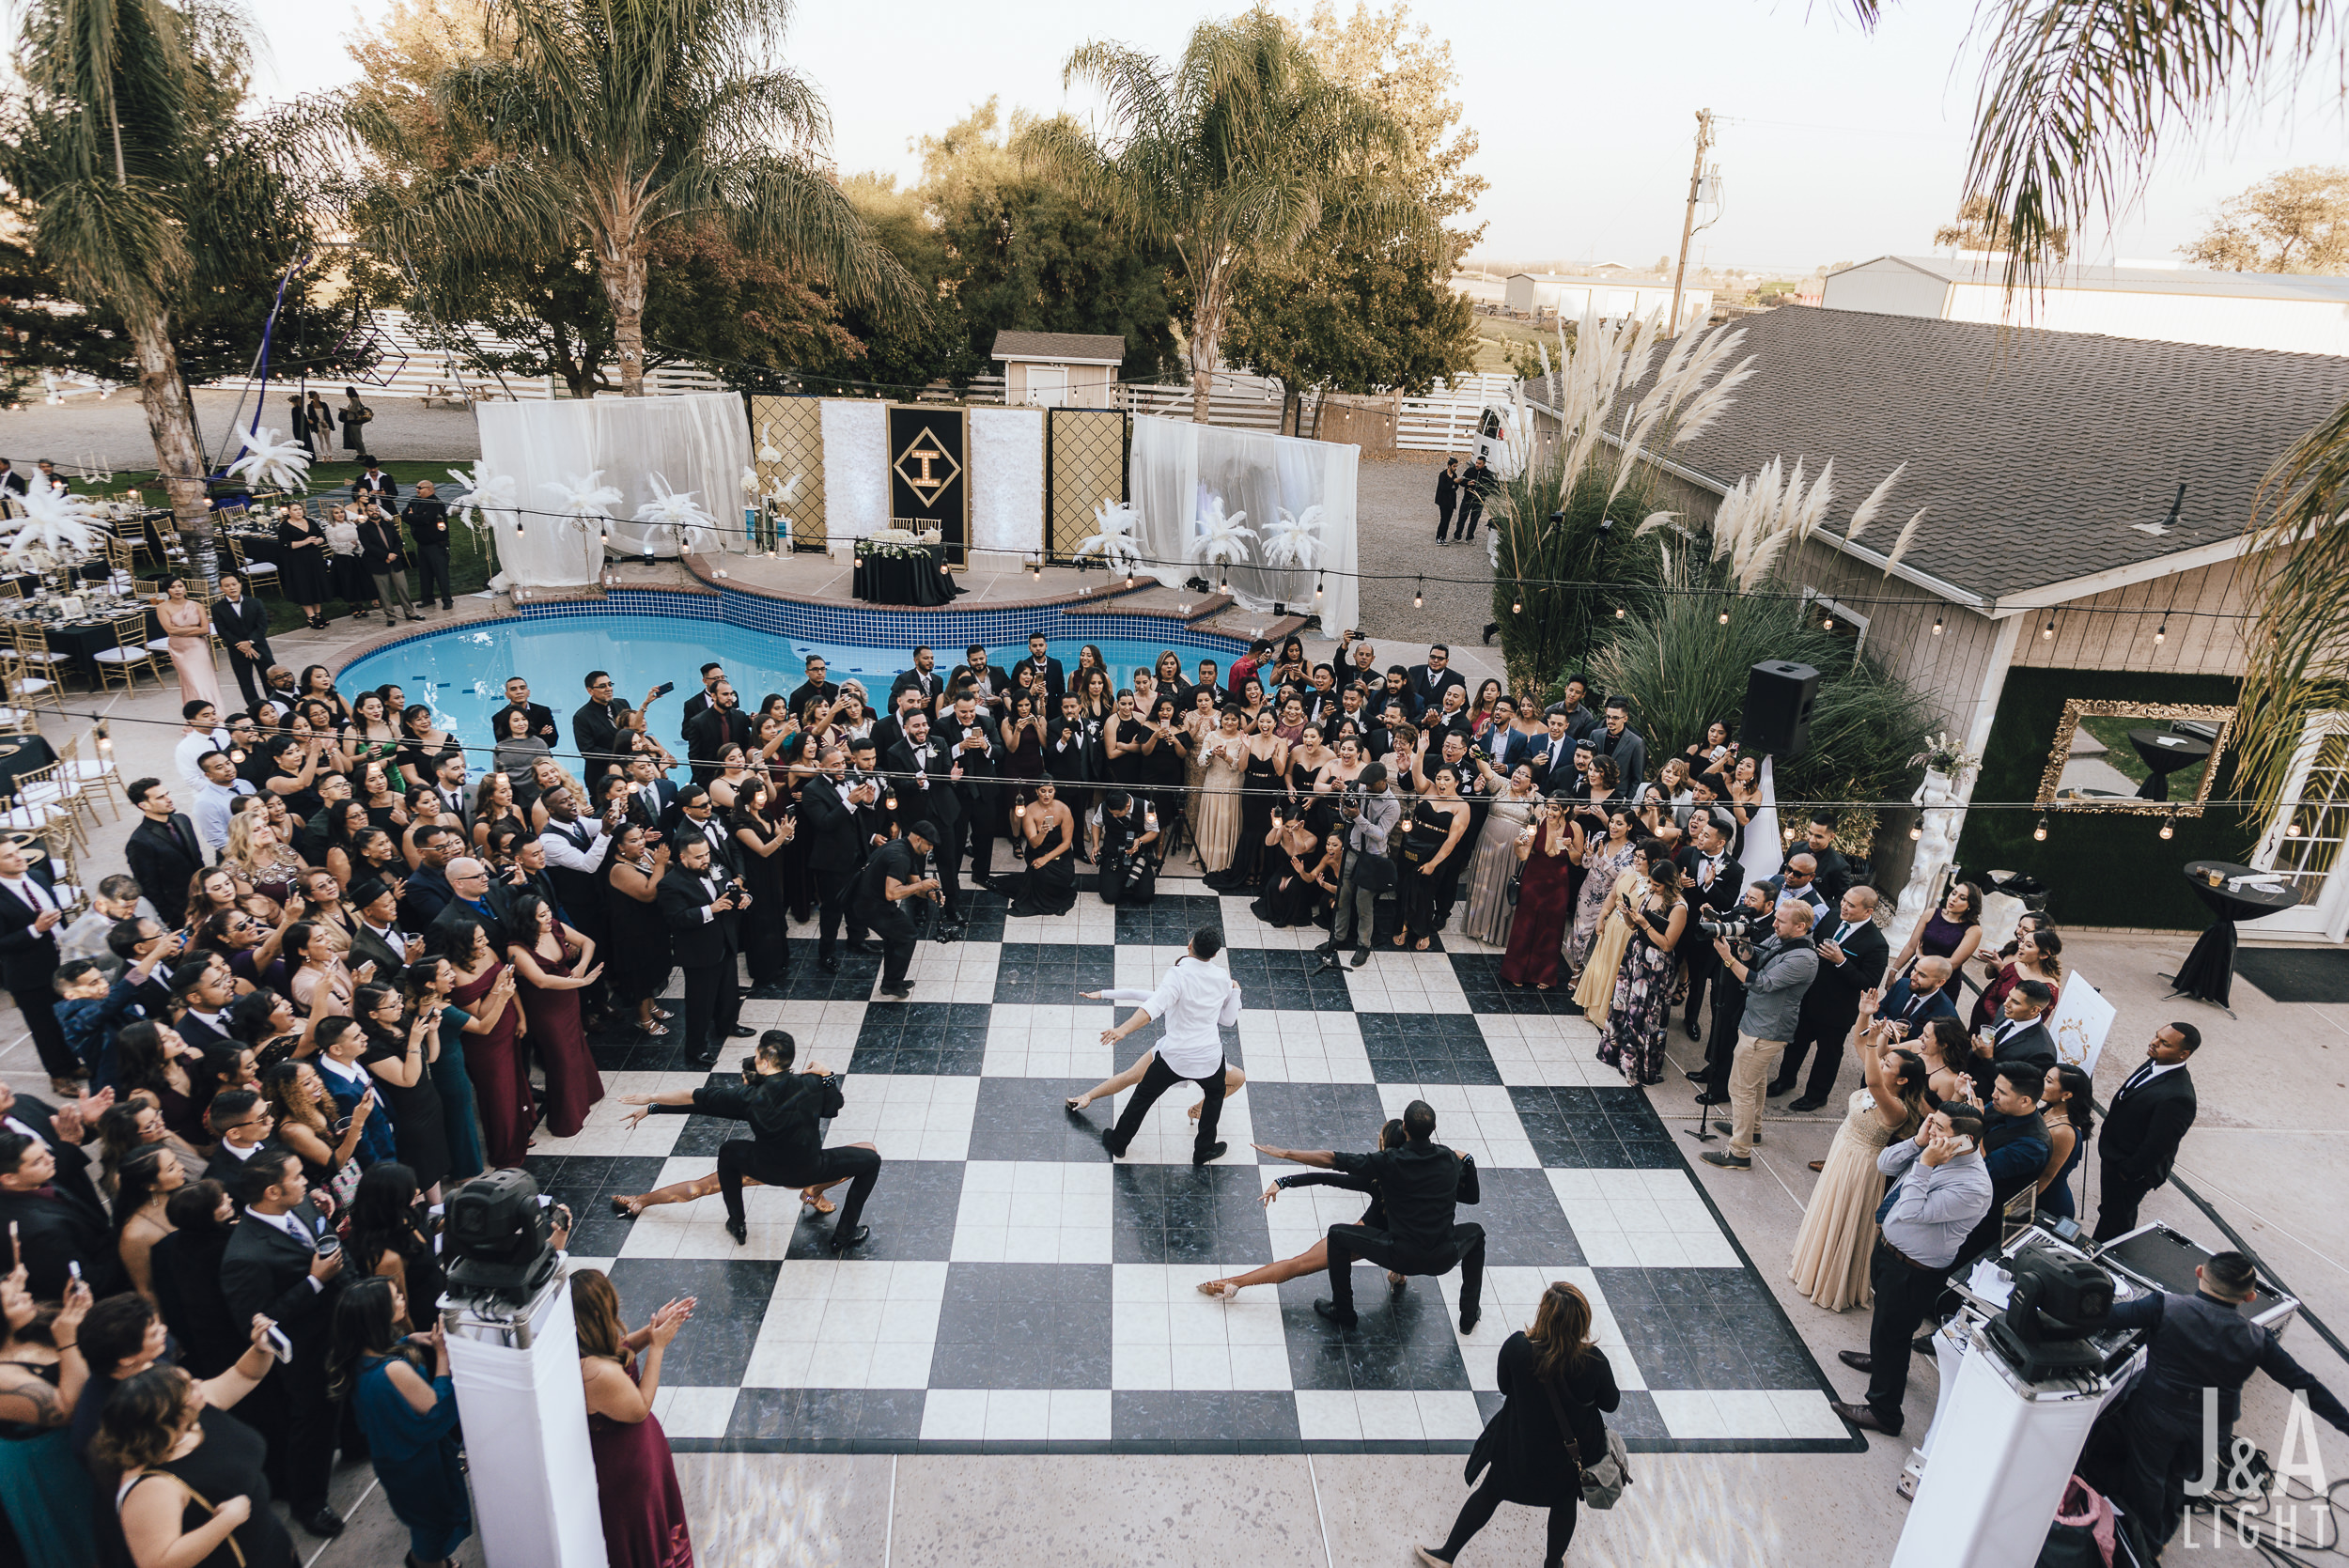 20171014-JanDan-LosBanos-GlassMansion-Wedding-Blog-062.jpg